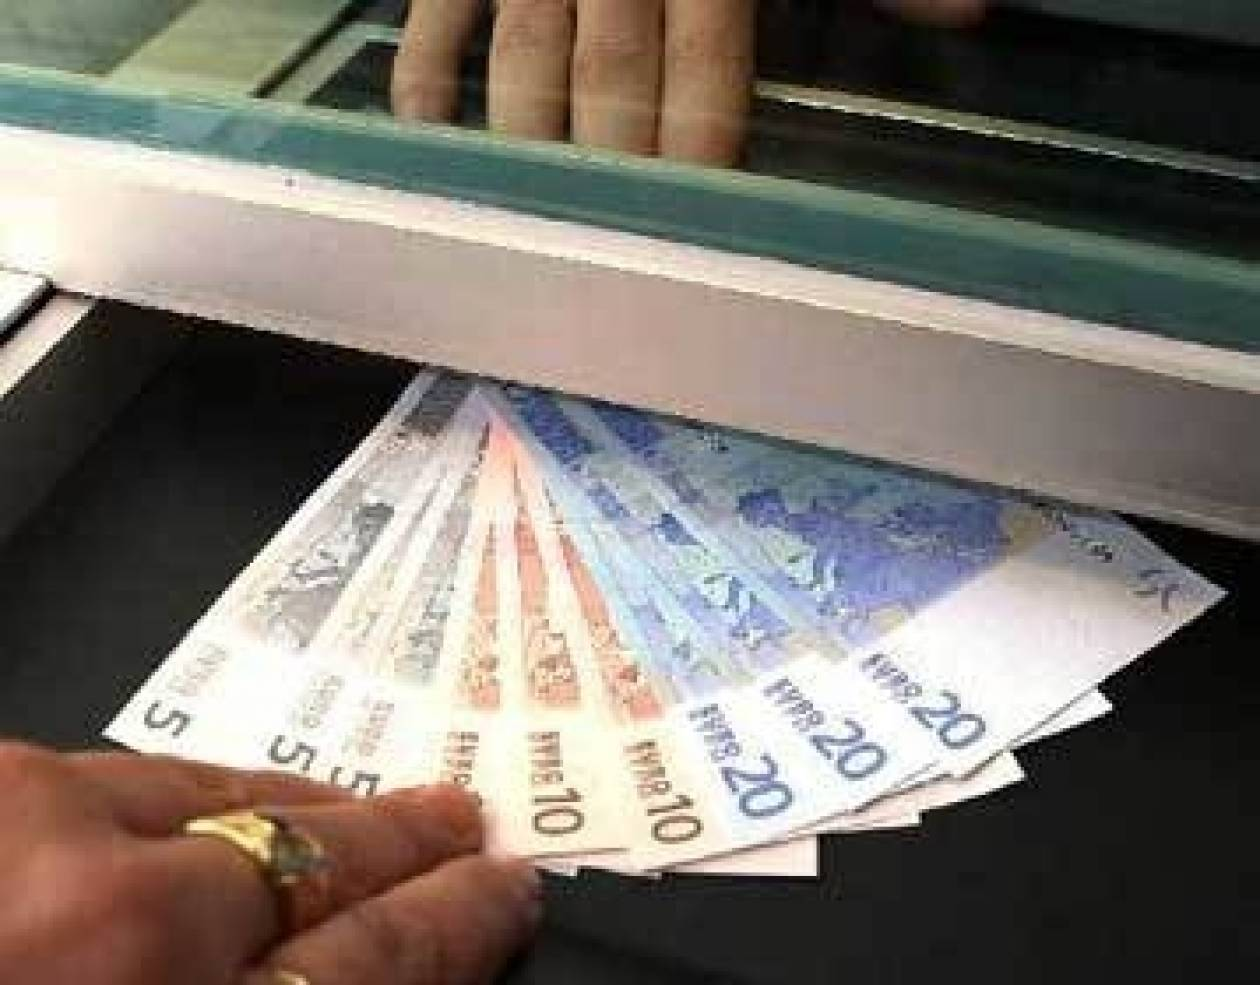 Alpha bank: Η ανακεφαλαιοποίηση τραπεζών δεν σημαίνει χορήγηση δανείων